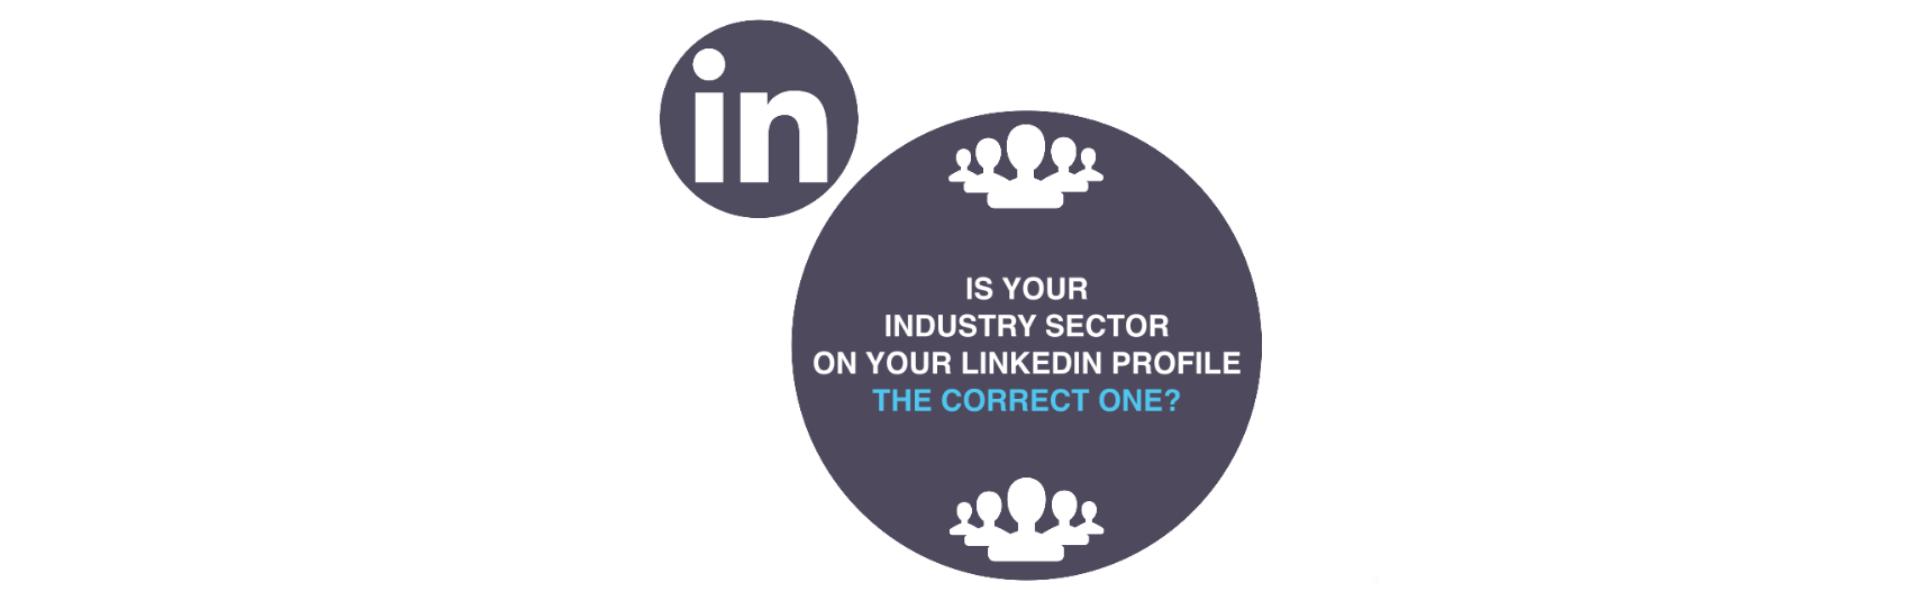 LinkedIn Industry Sector List Guide